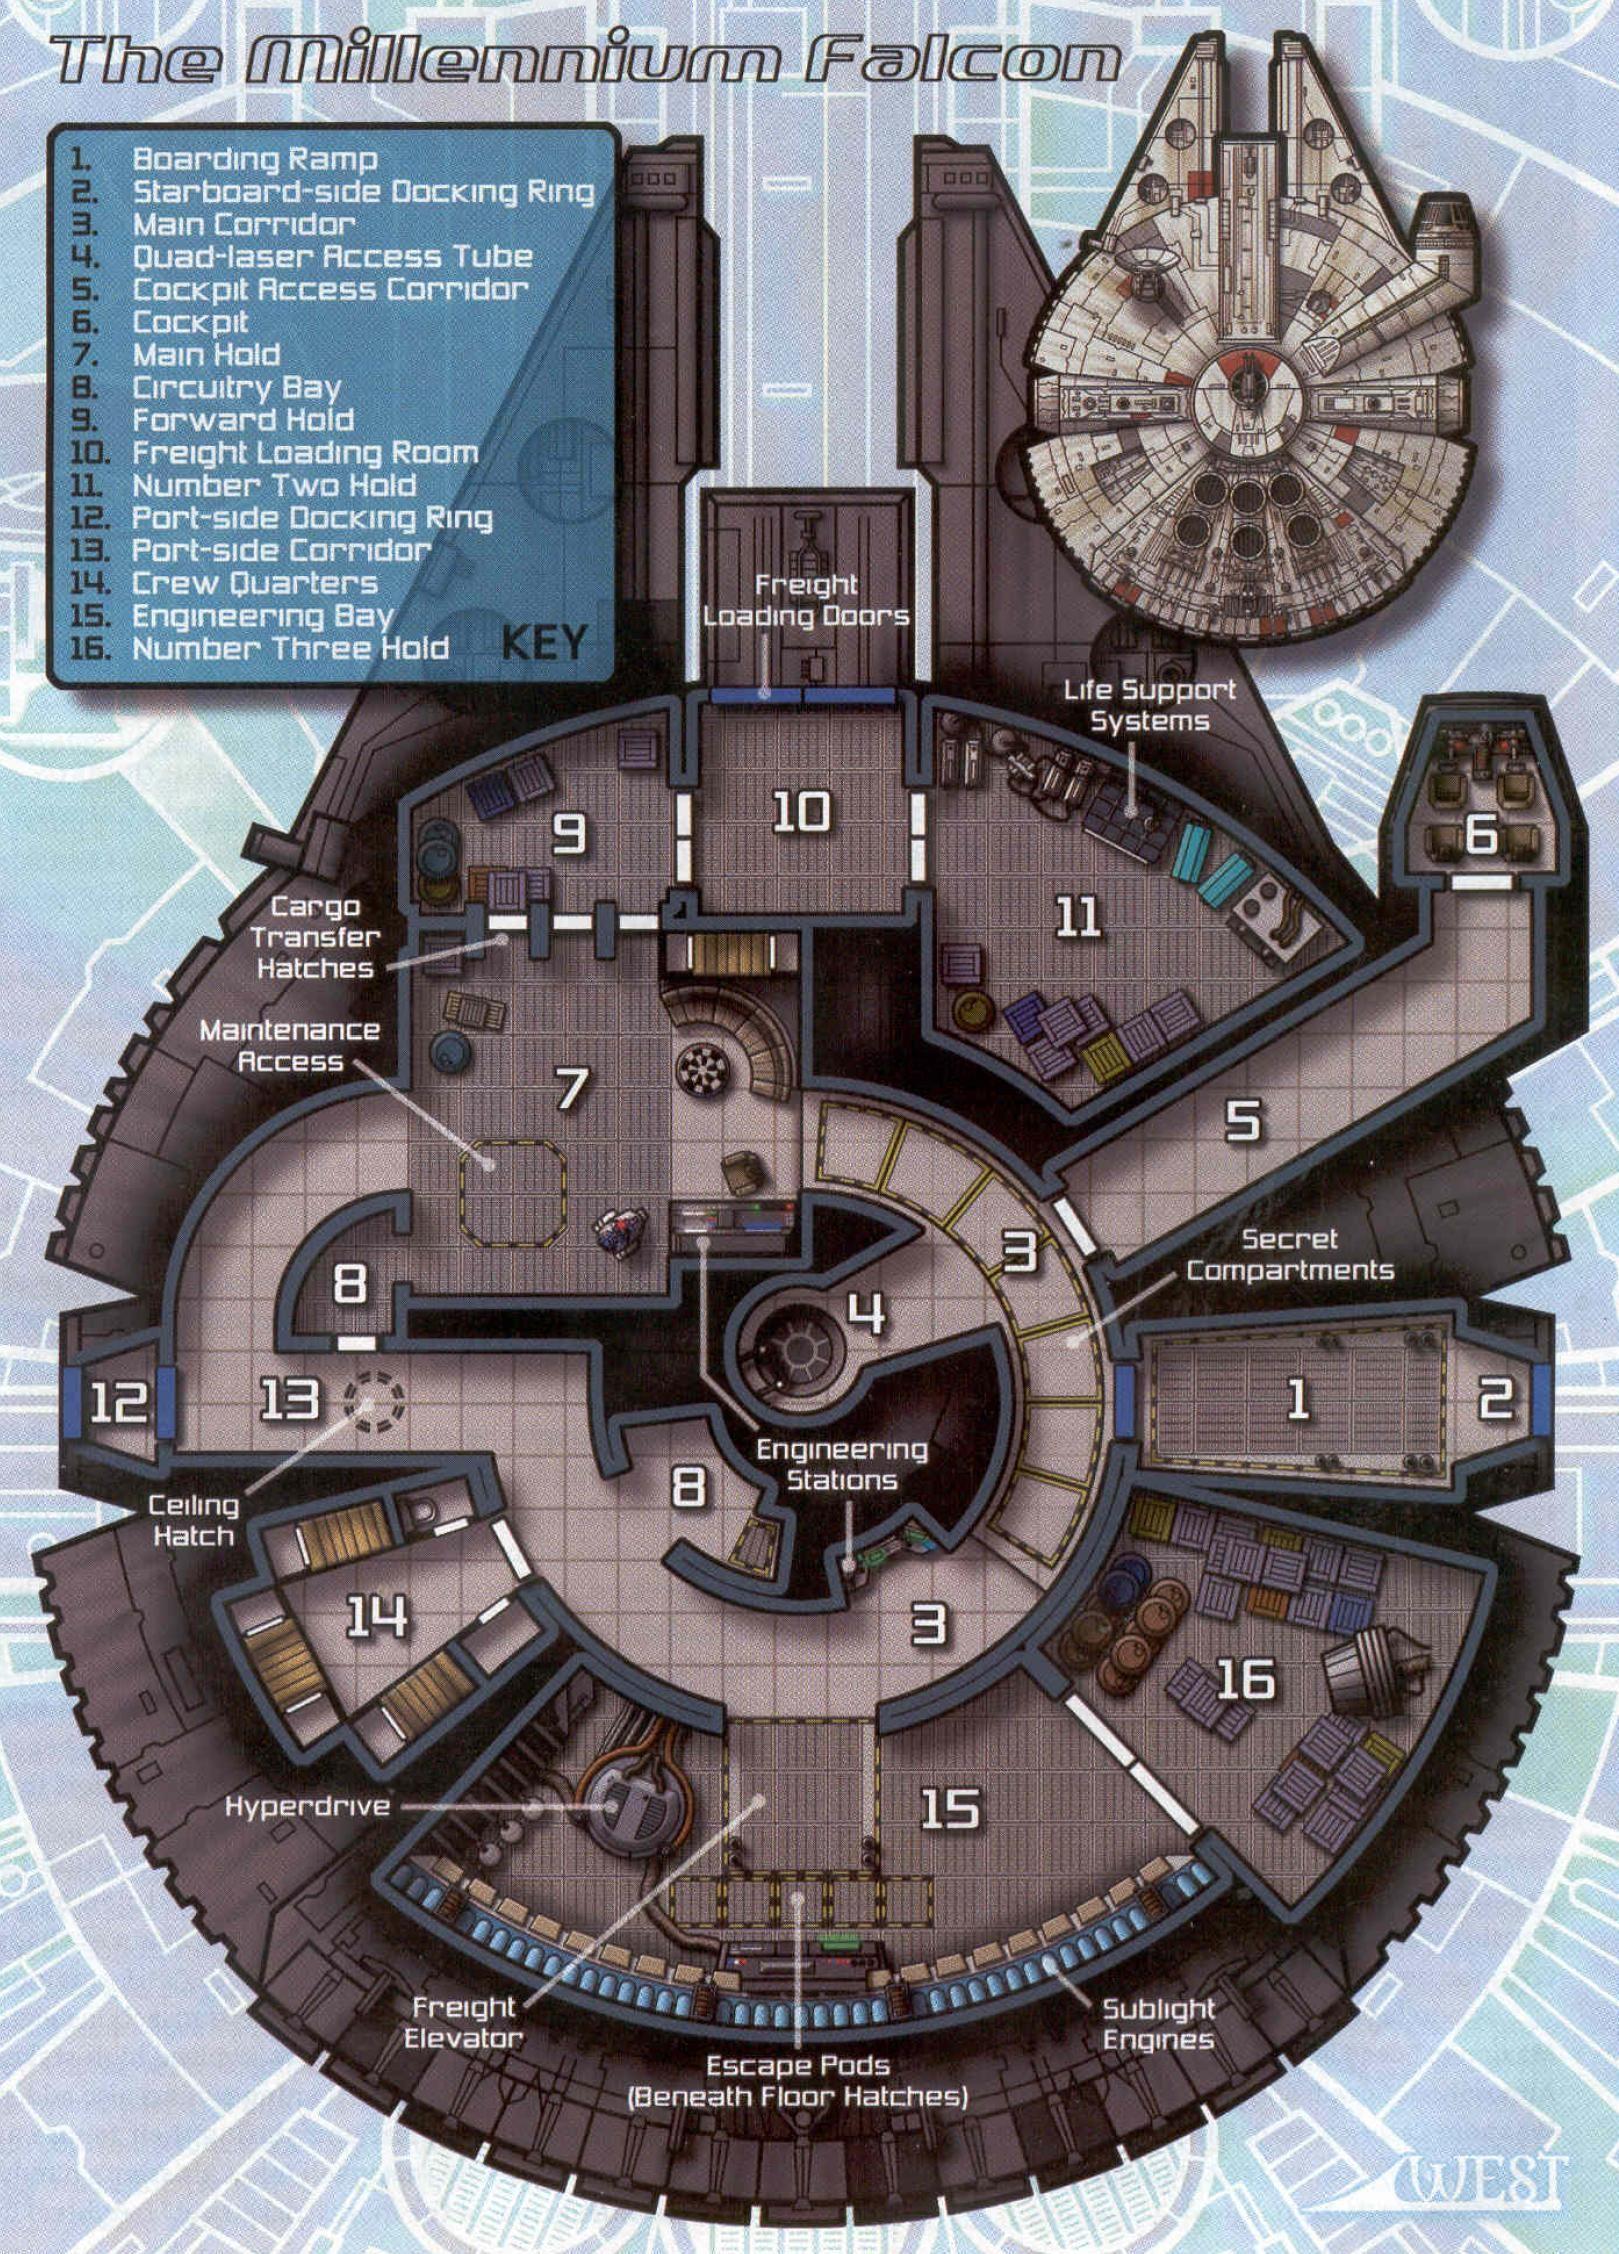 Millennium Falcon Star Wars Ships Star Wars Rpg Star